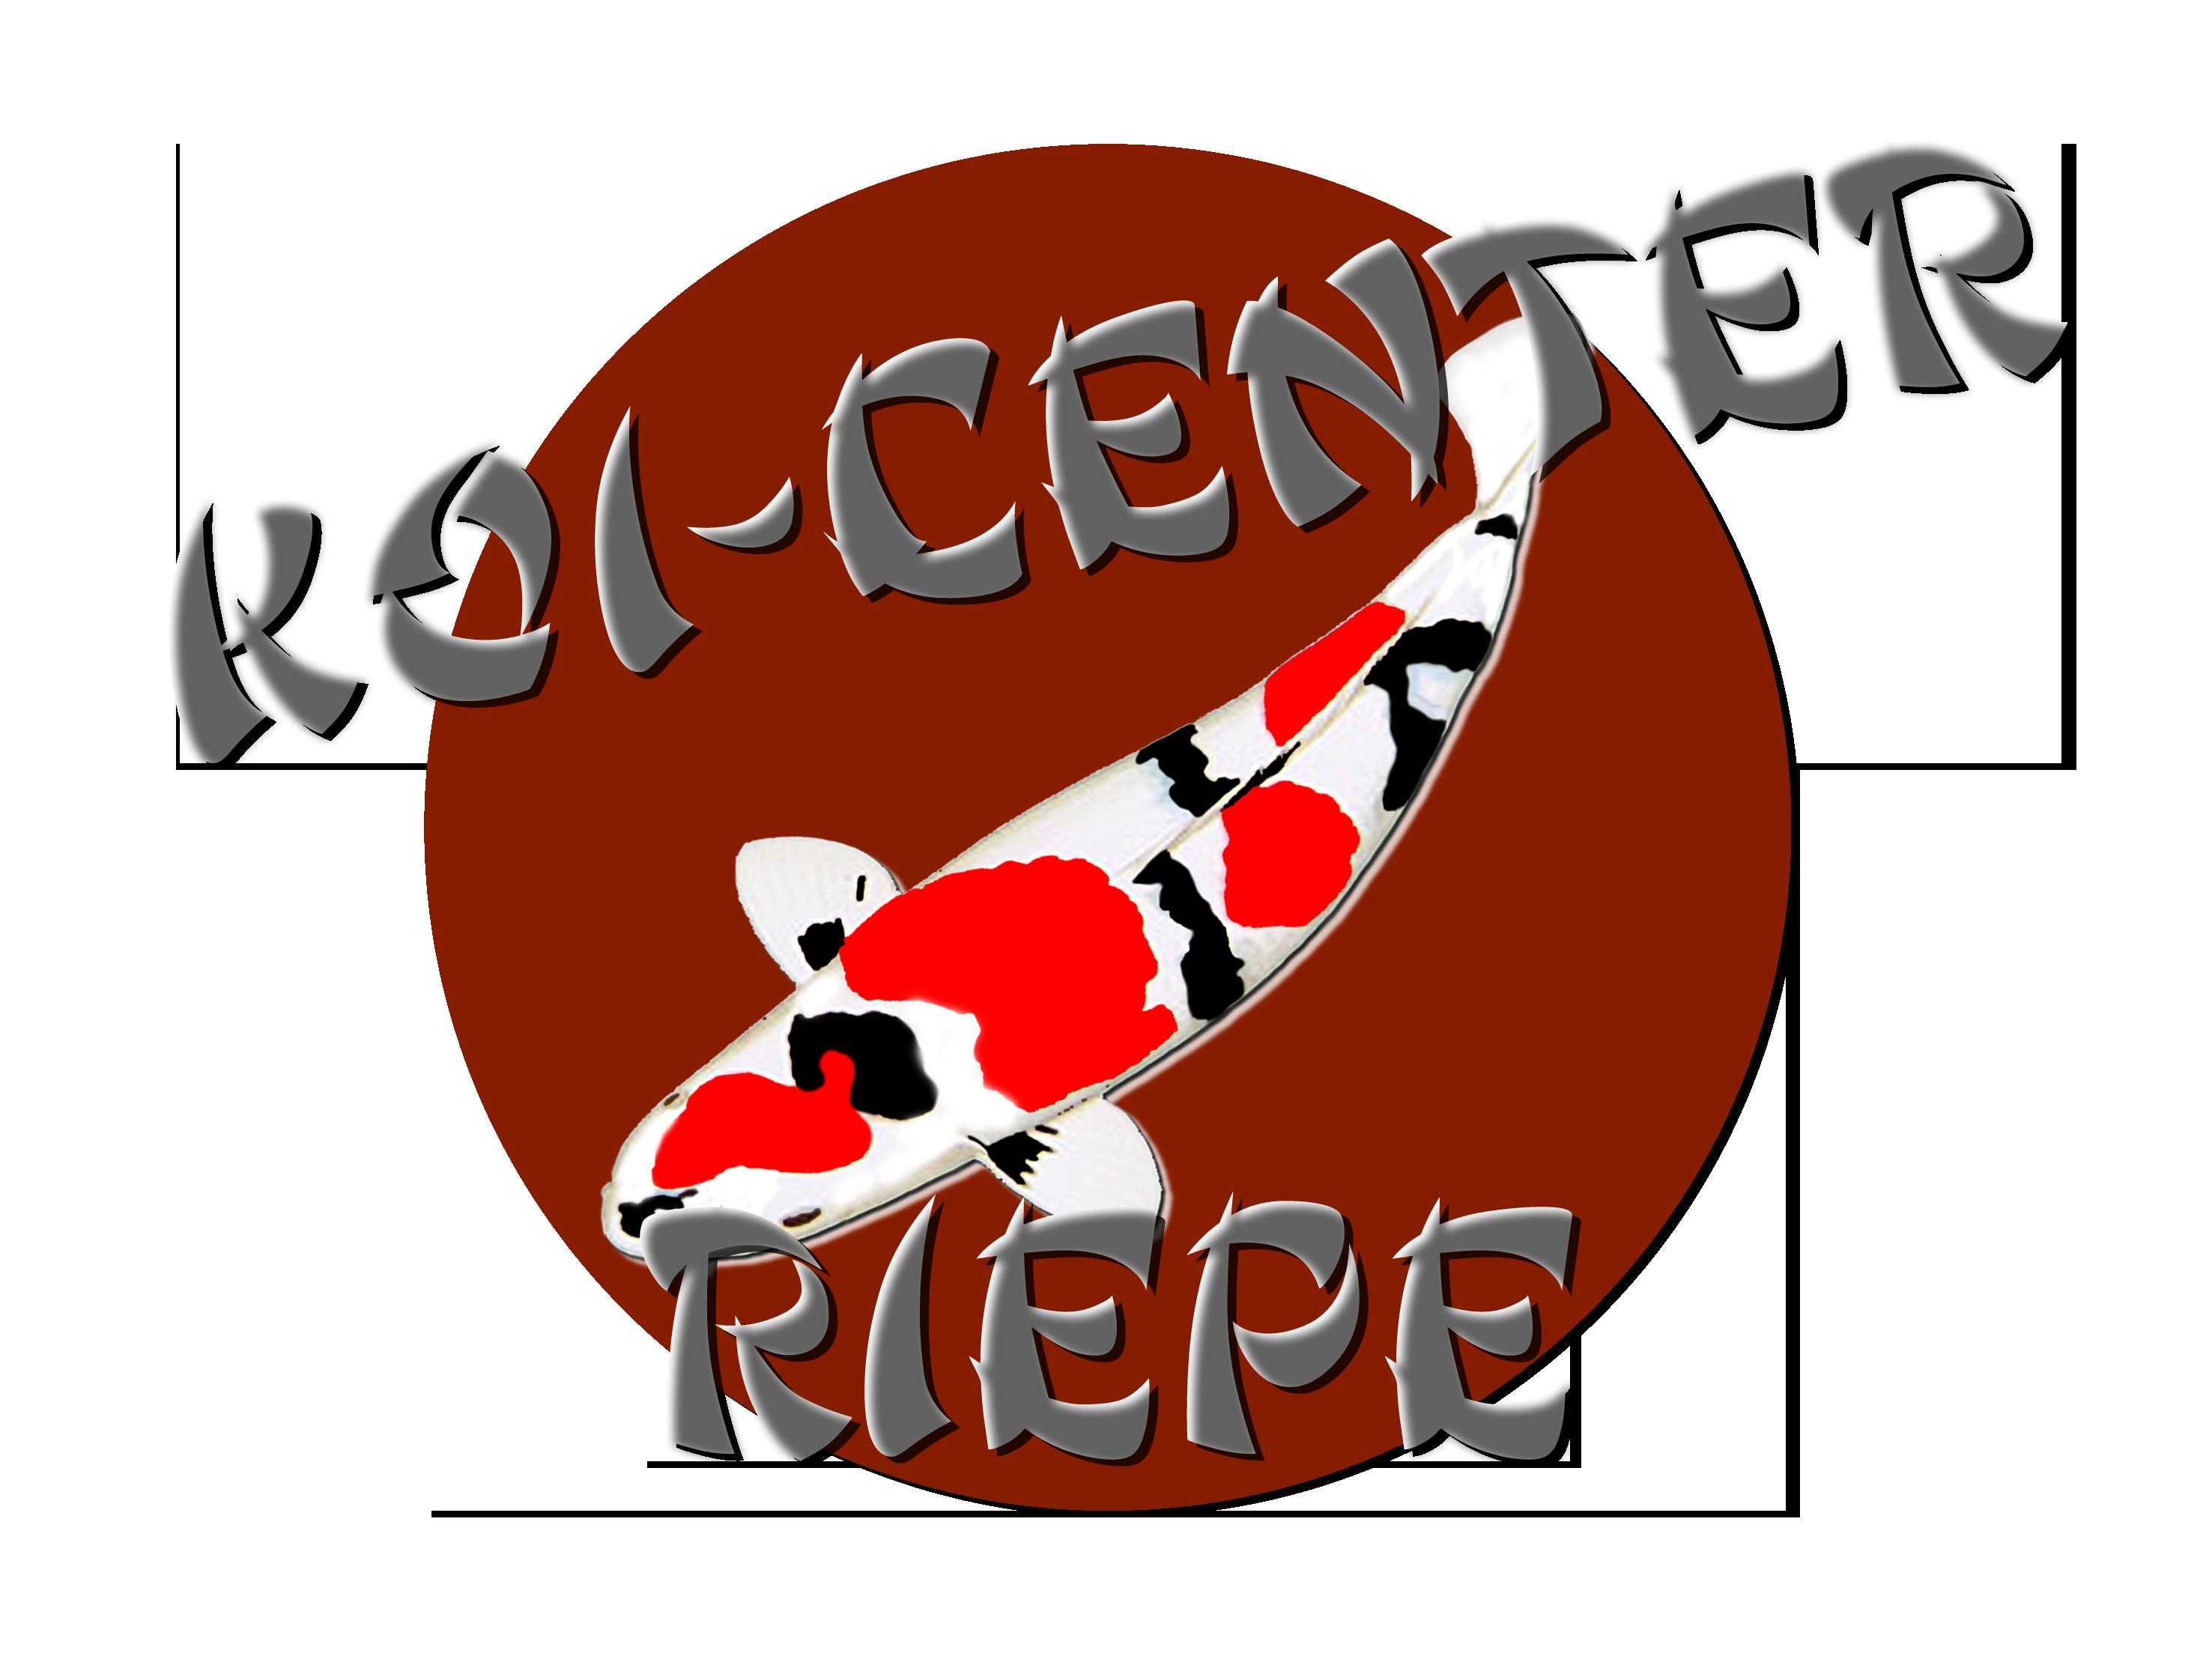 Koi Center Riepe GmbH - Webshop